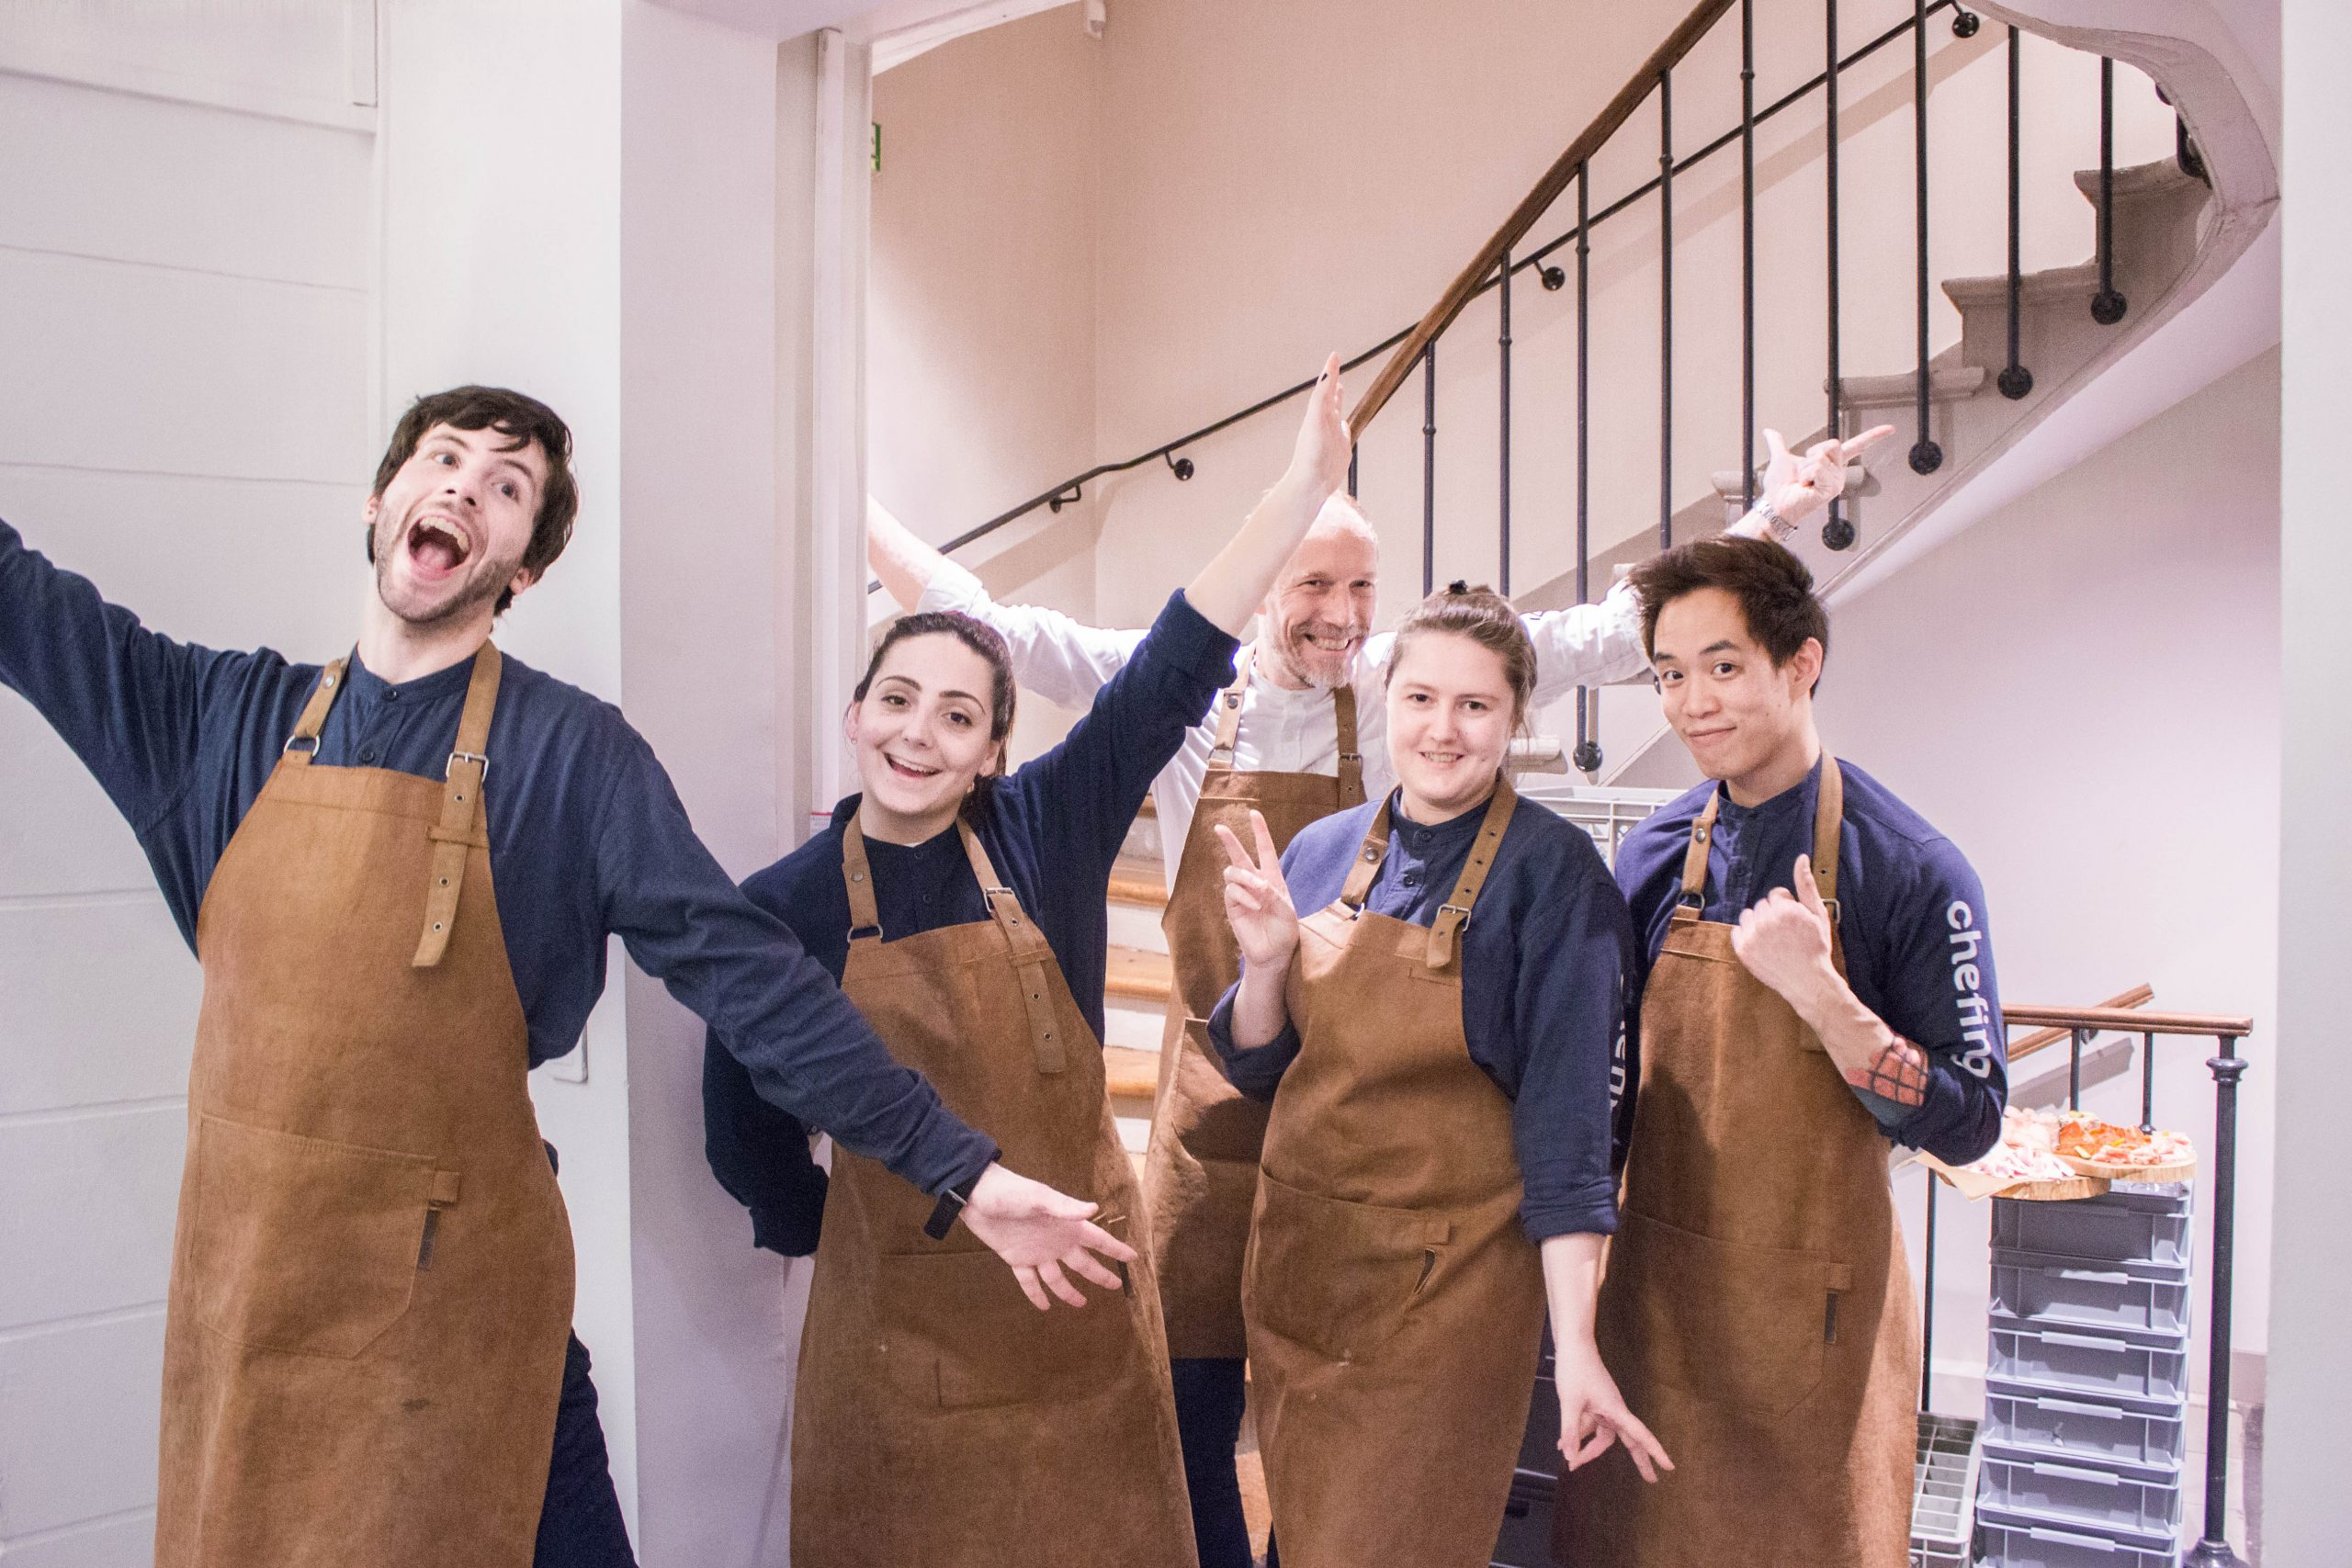 staff_chefing